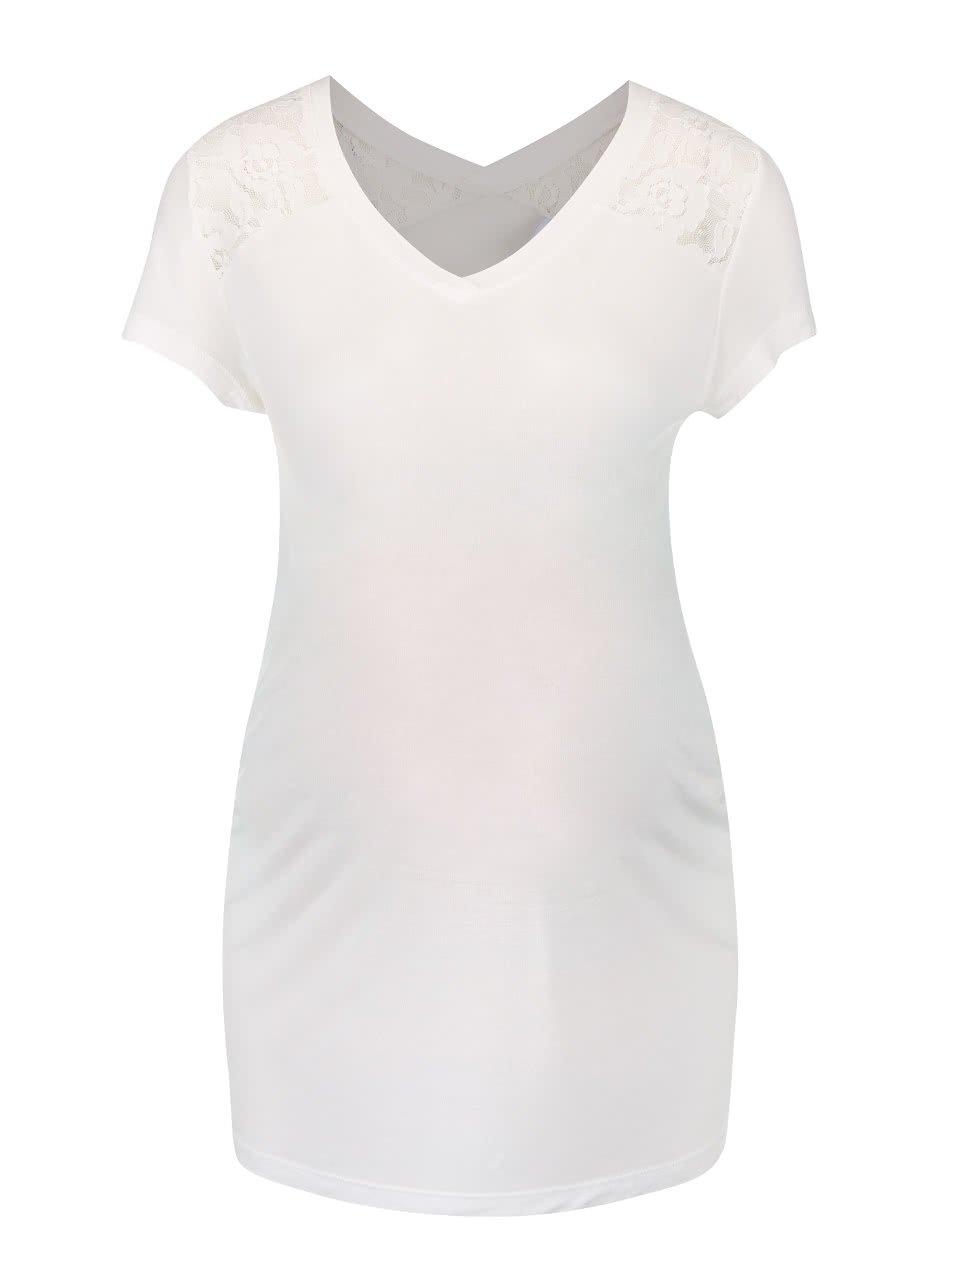 Krémové těhotenské tričko Mama.licious Quick